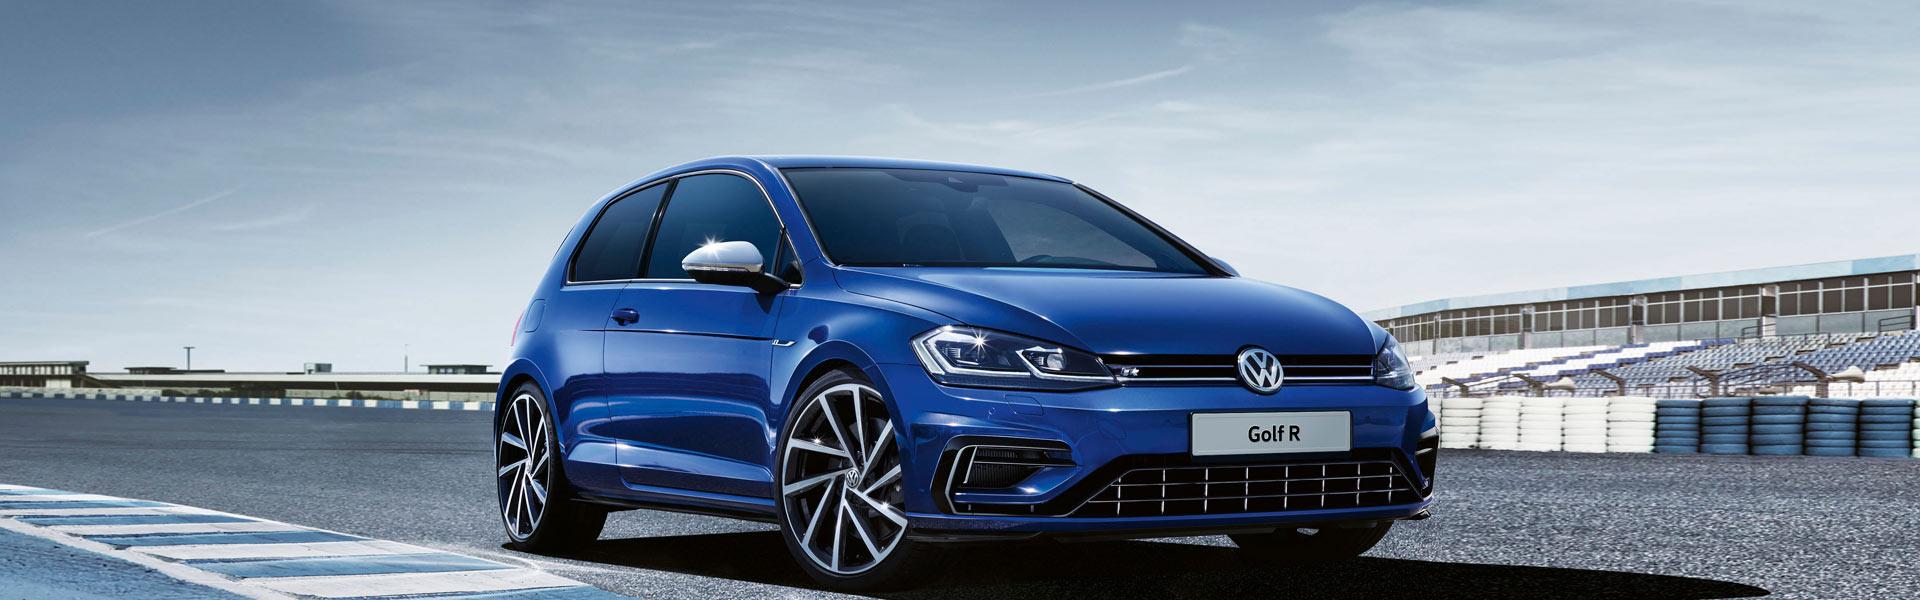 Запчасти на Volkswagen Golf